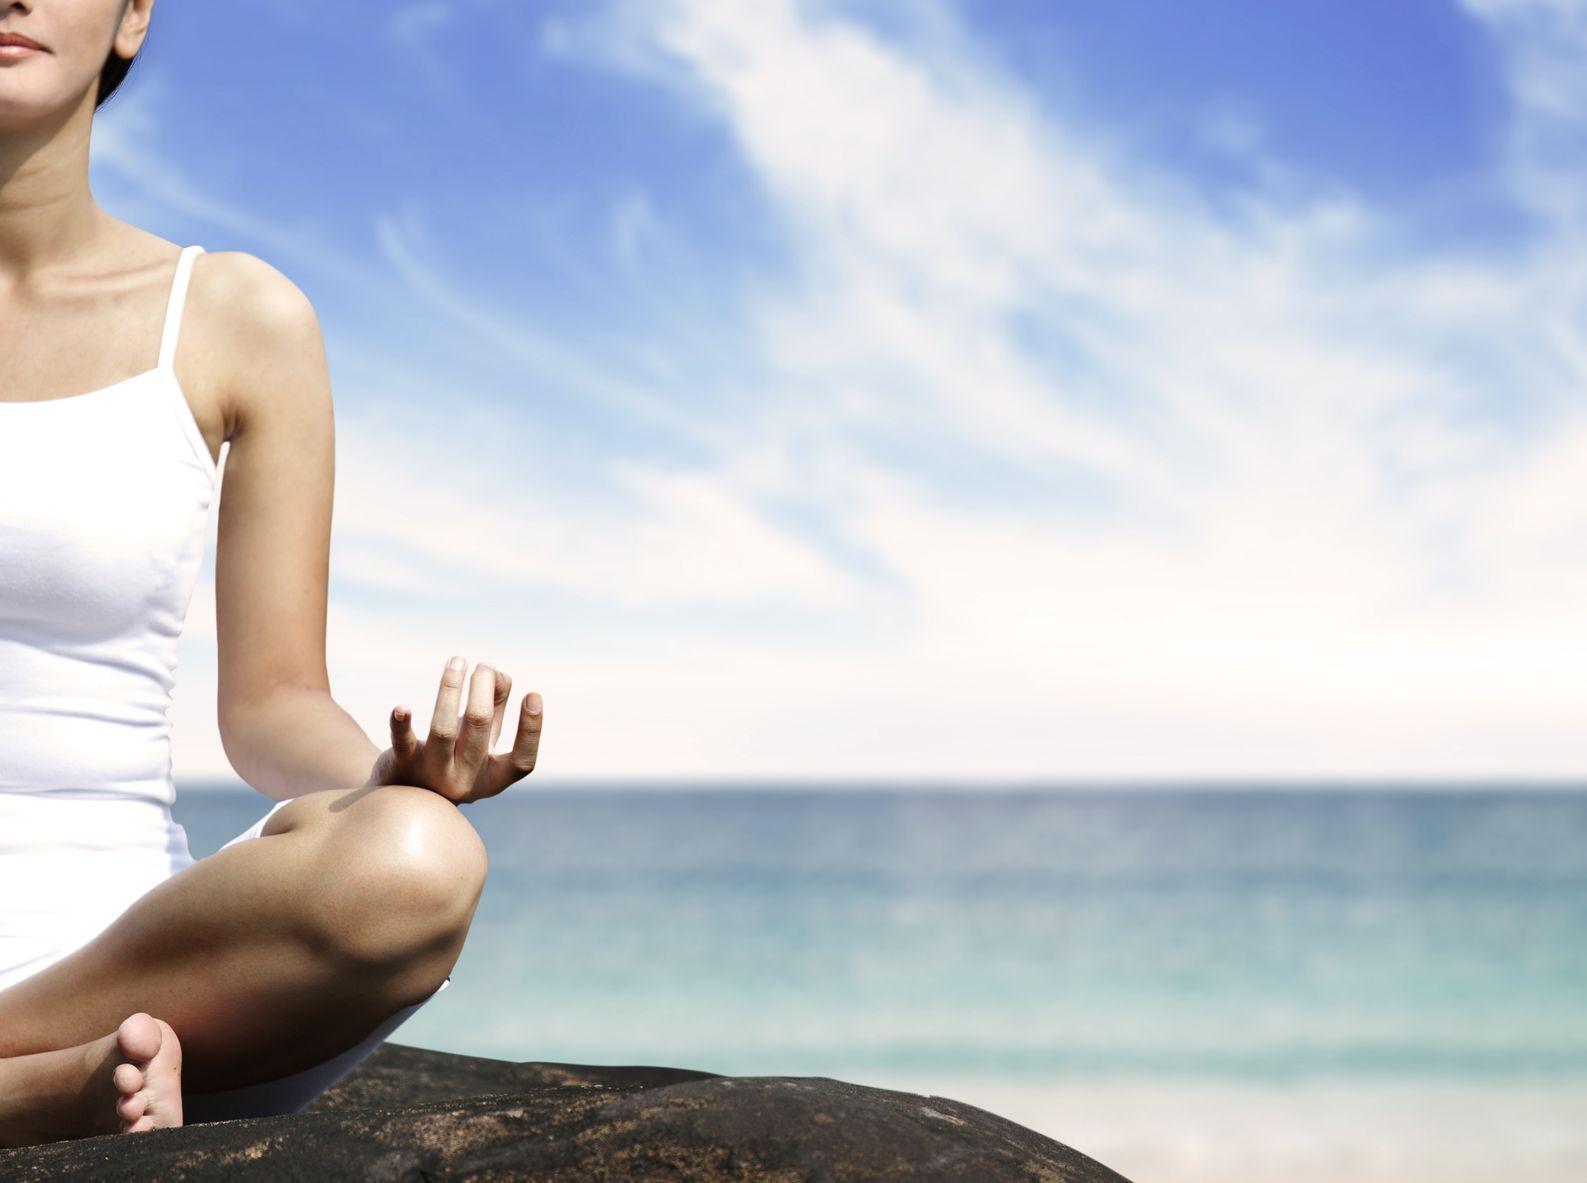 sundhed boern soeger ro i yoga